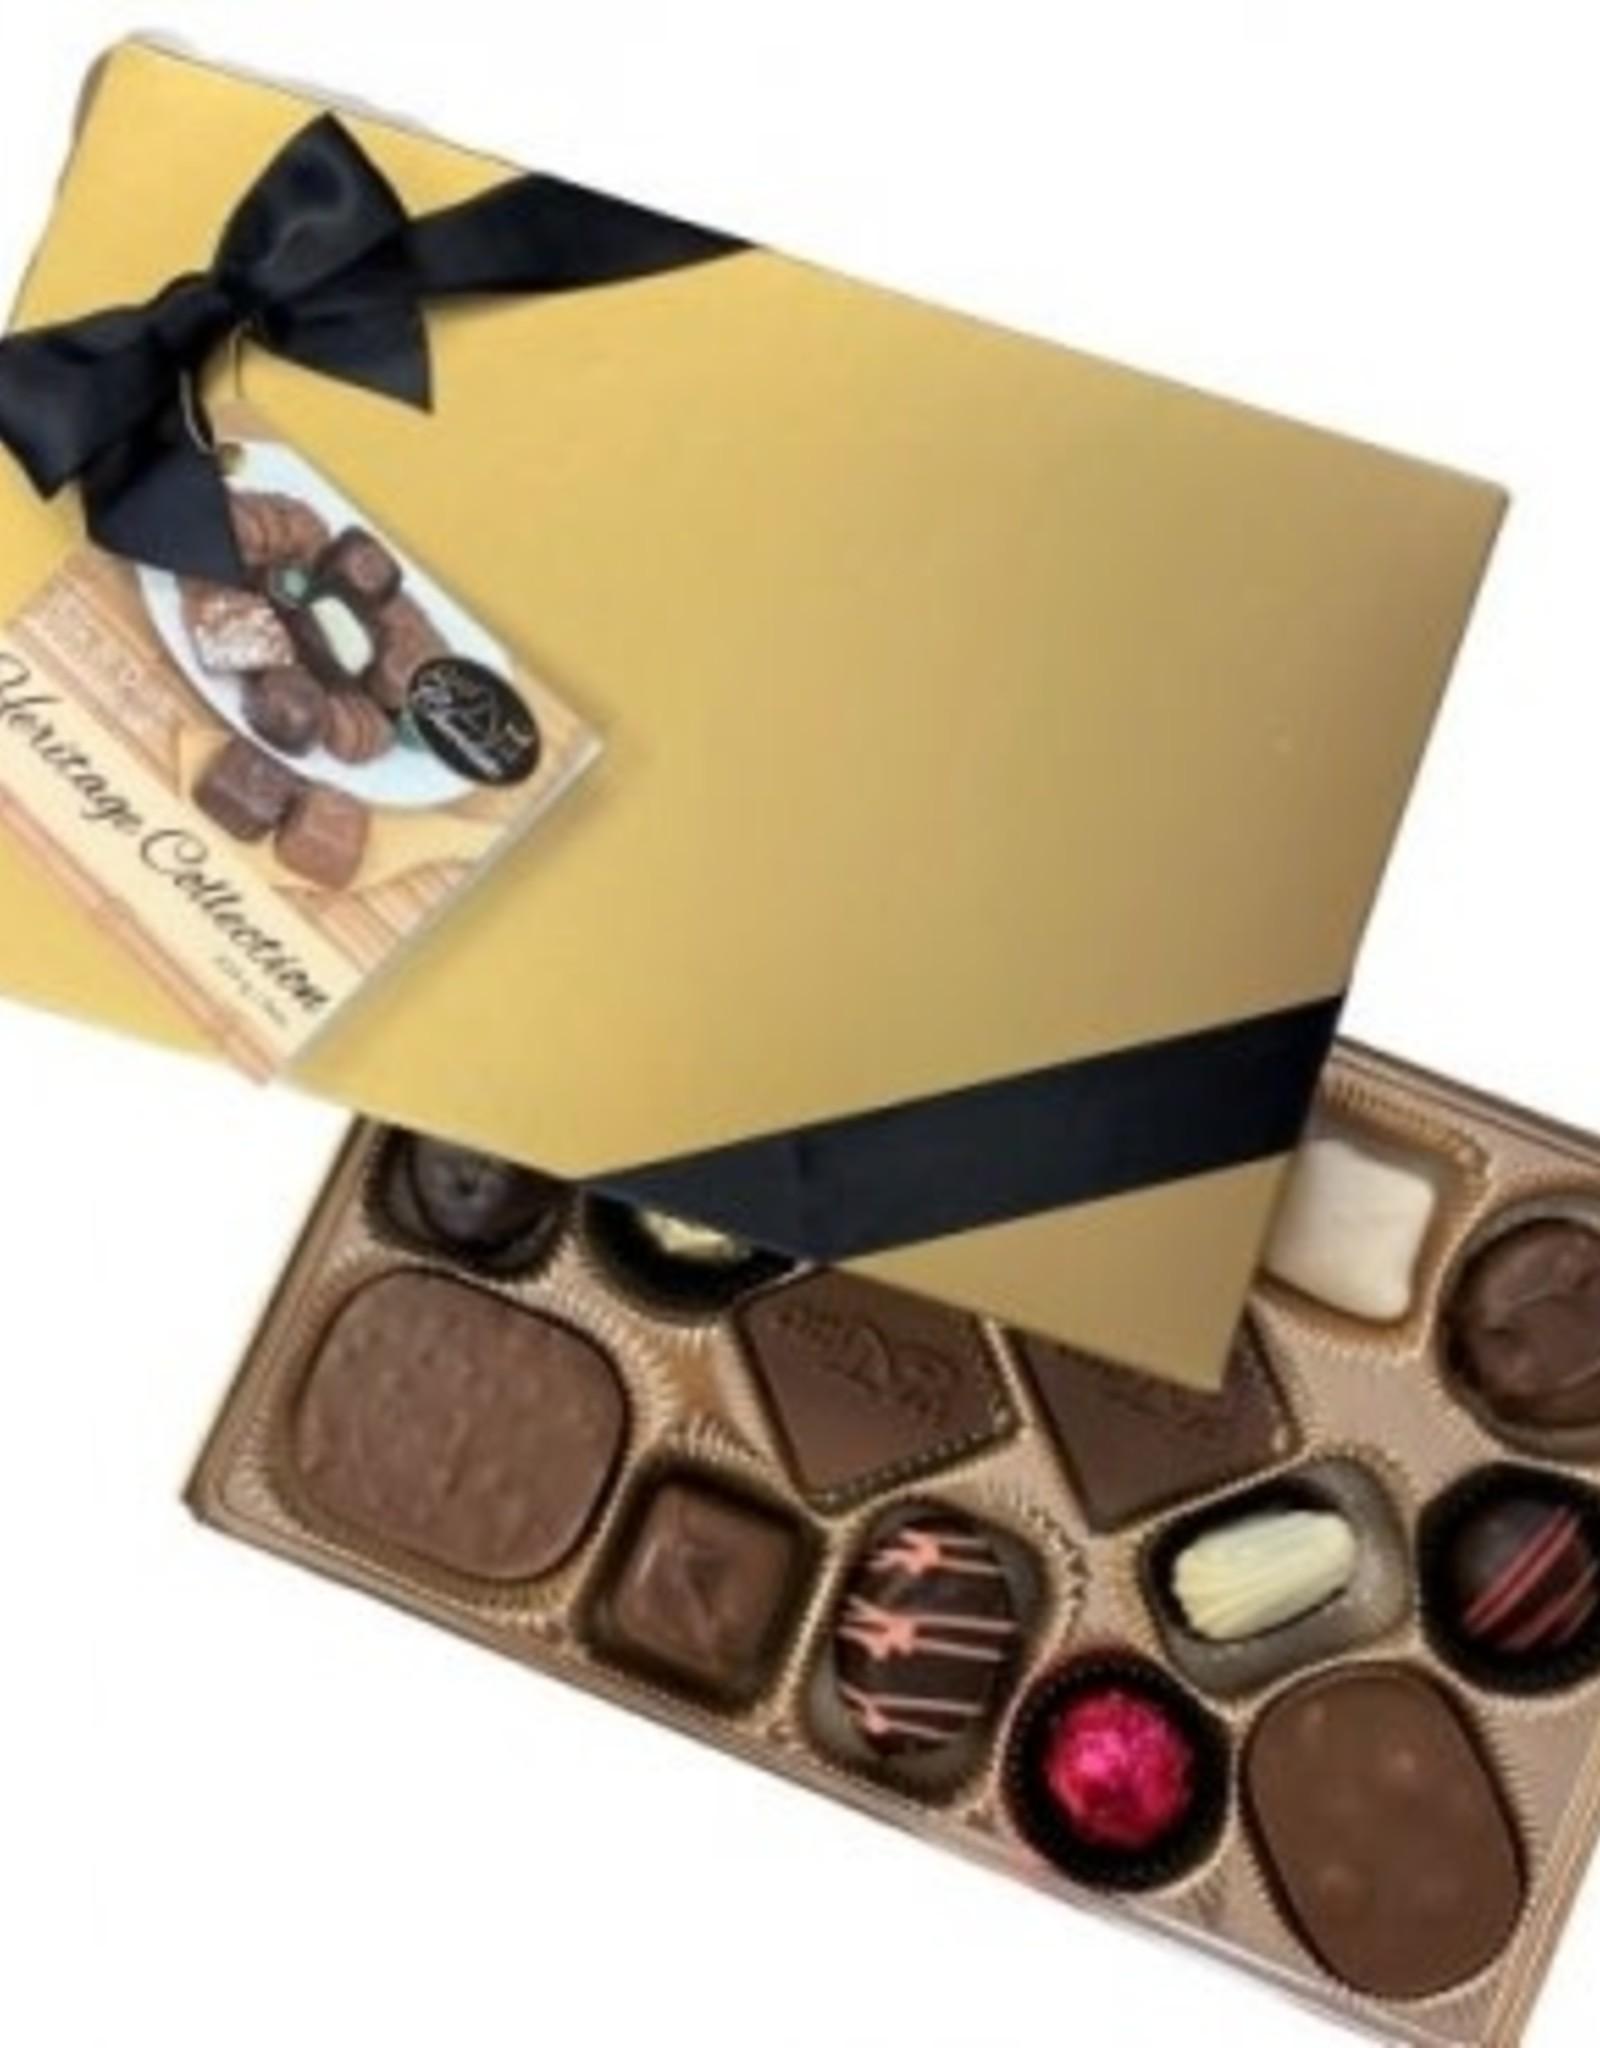 Andea Chocolate Chocolate Assortment 16 pces